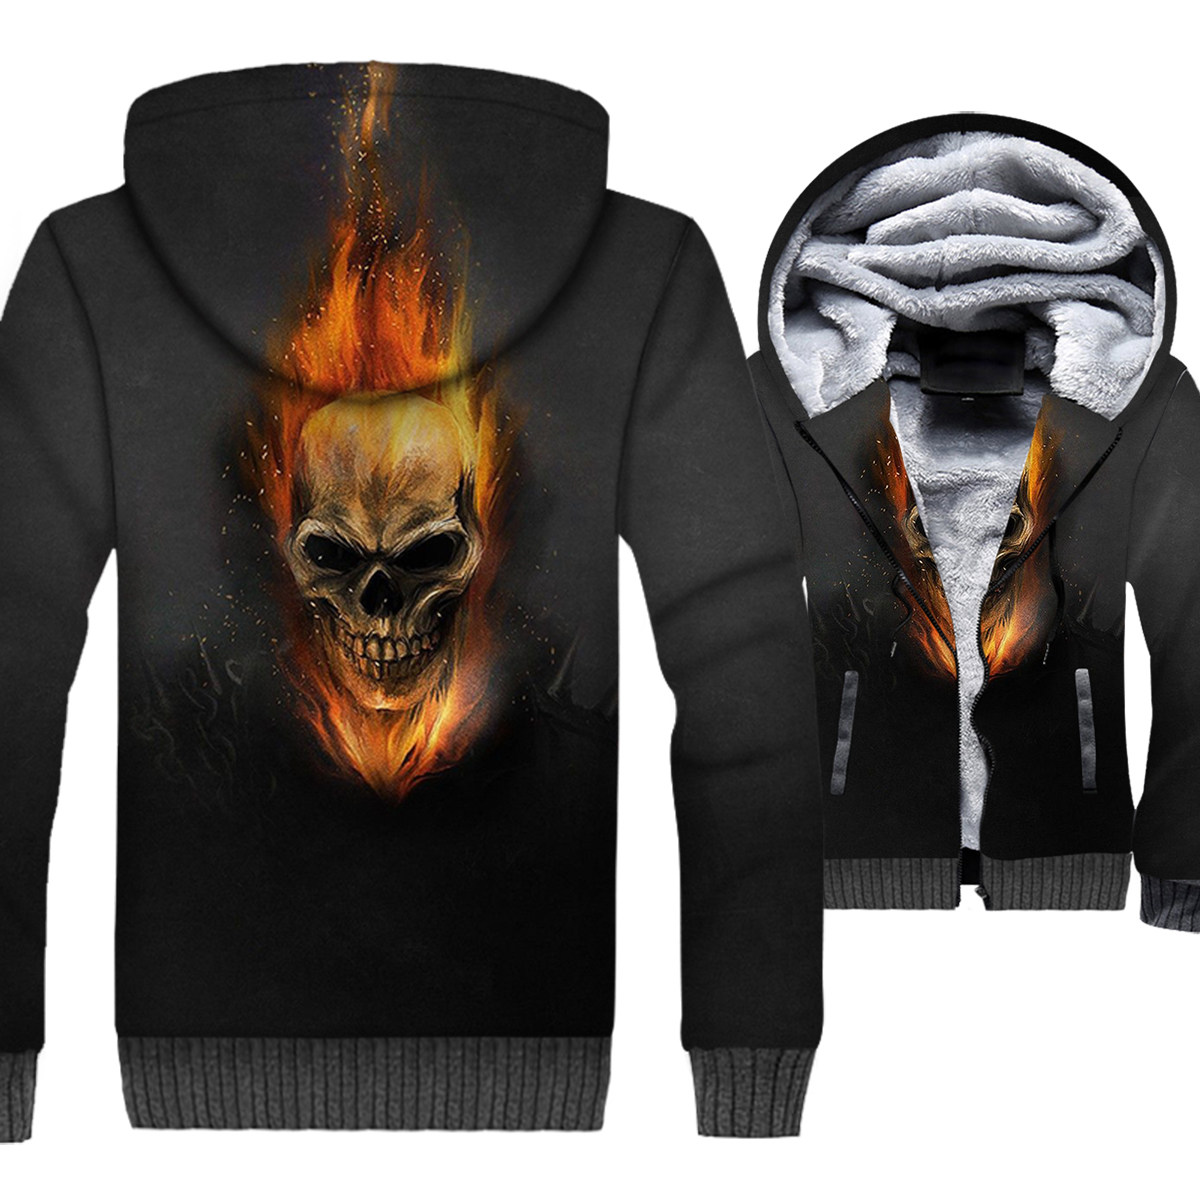 Ghost Rider Skull 3D Print Hoodie Men Hip Hop Hooded Sweatshirt Winter Thick Fleece Warm Zip up Coat Swag Gothic Skeleton Jacket